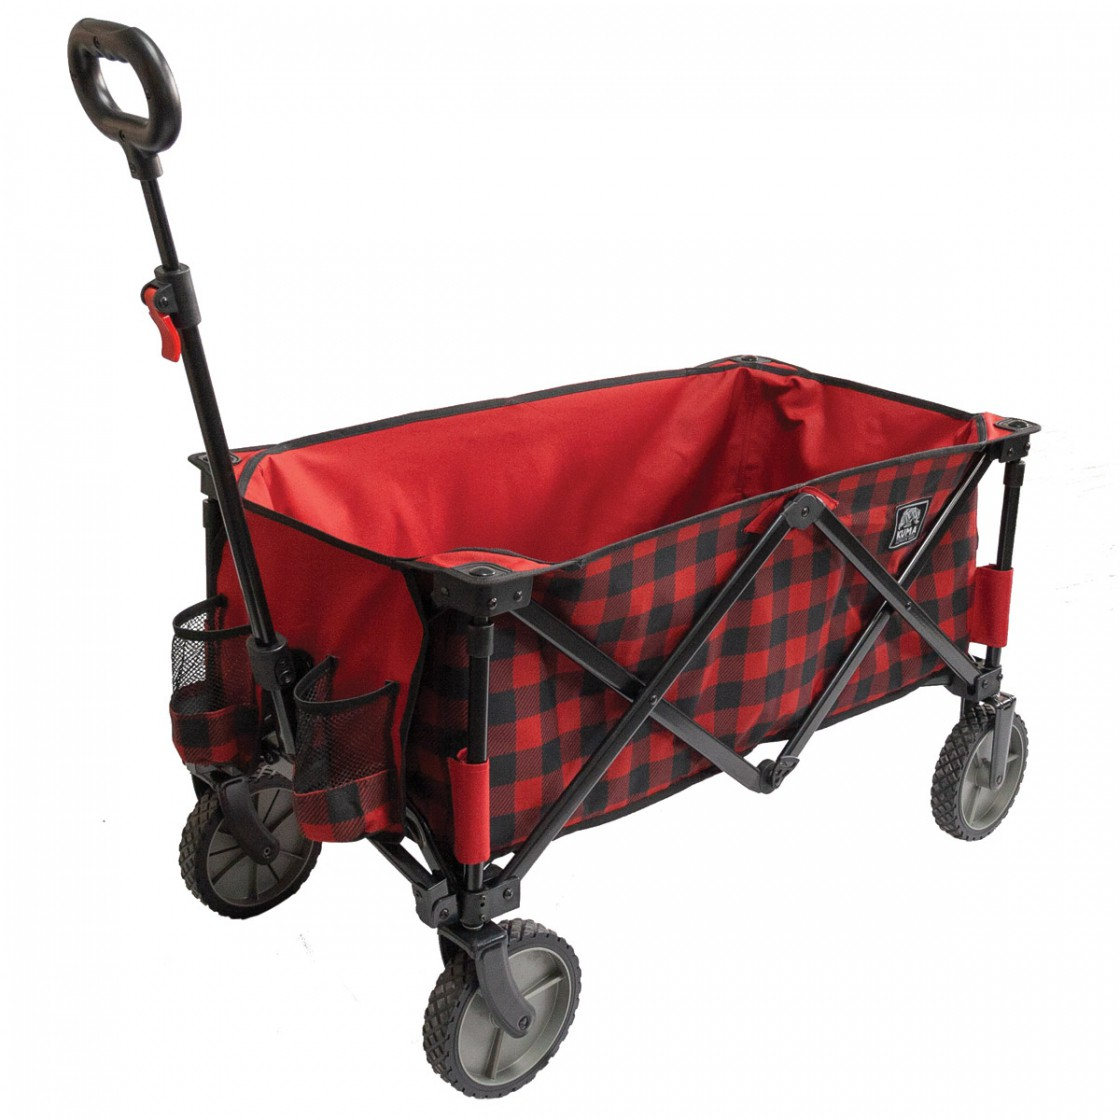 kuma bear buggy cart wagon - red plaid